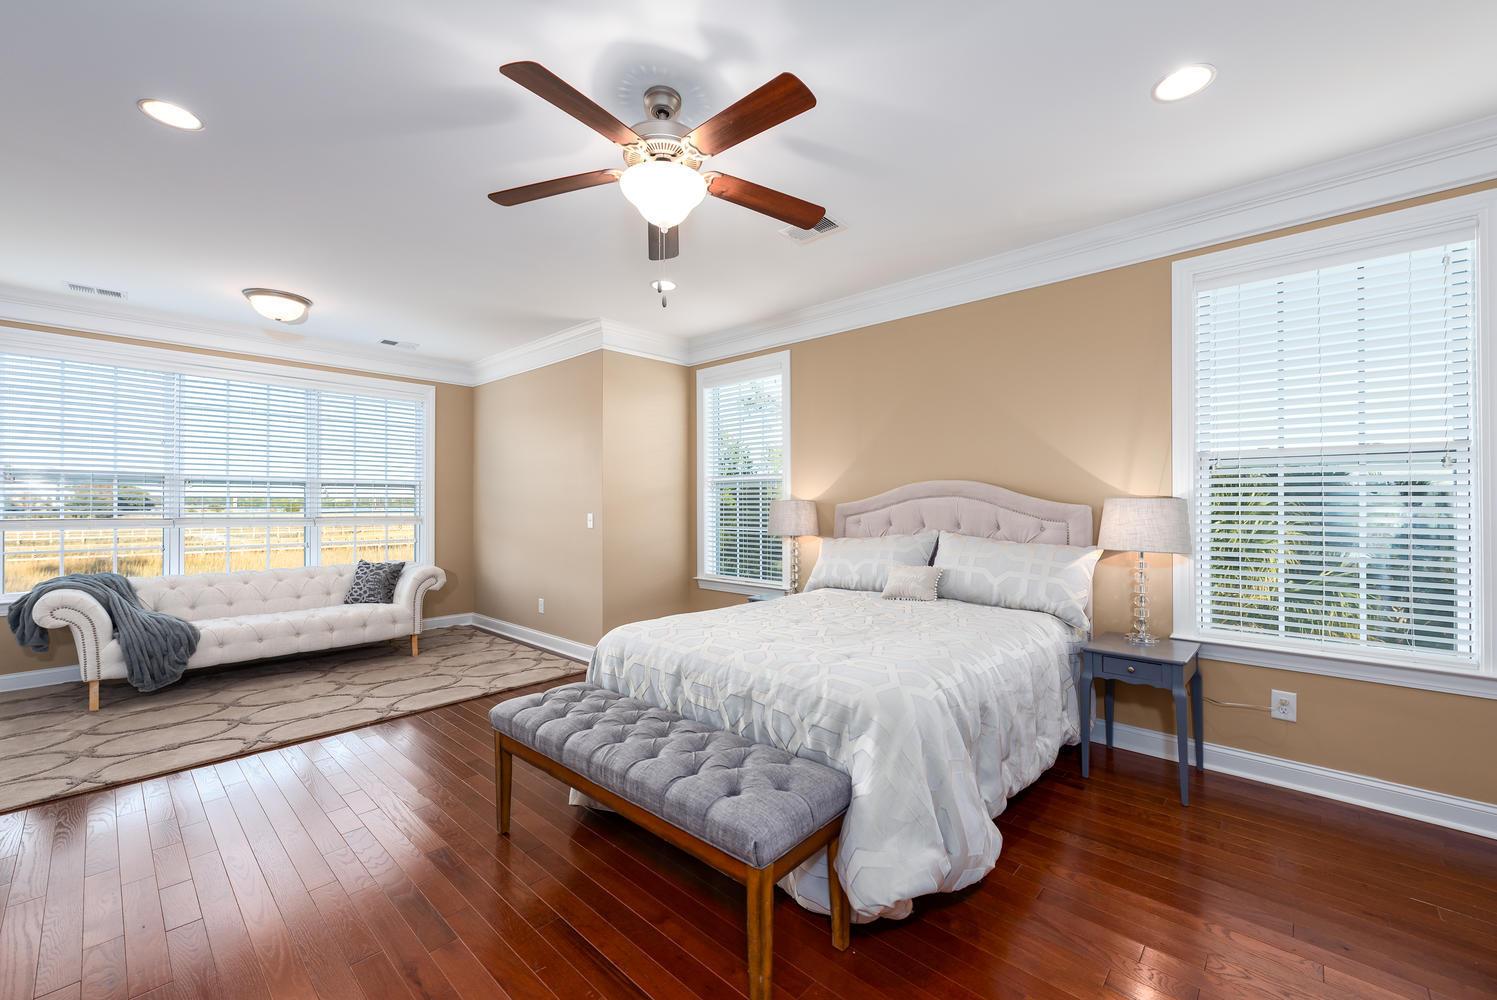 River Reach Pointe Homes For Sale - 1216 Rivers Reach Drive, Charleston, SC - 55